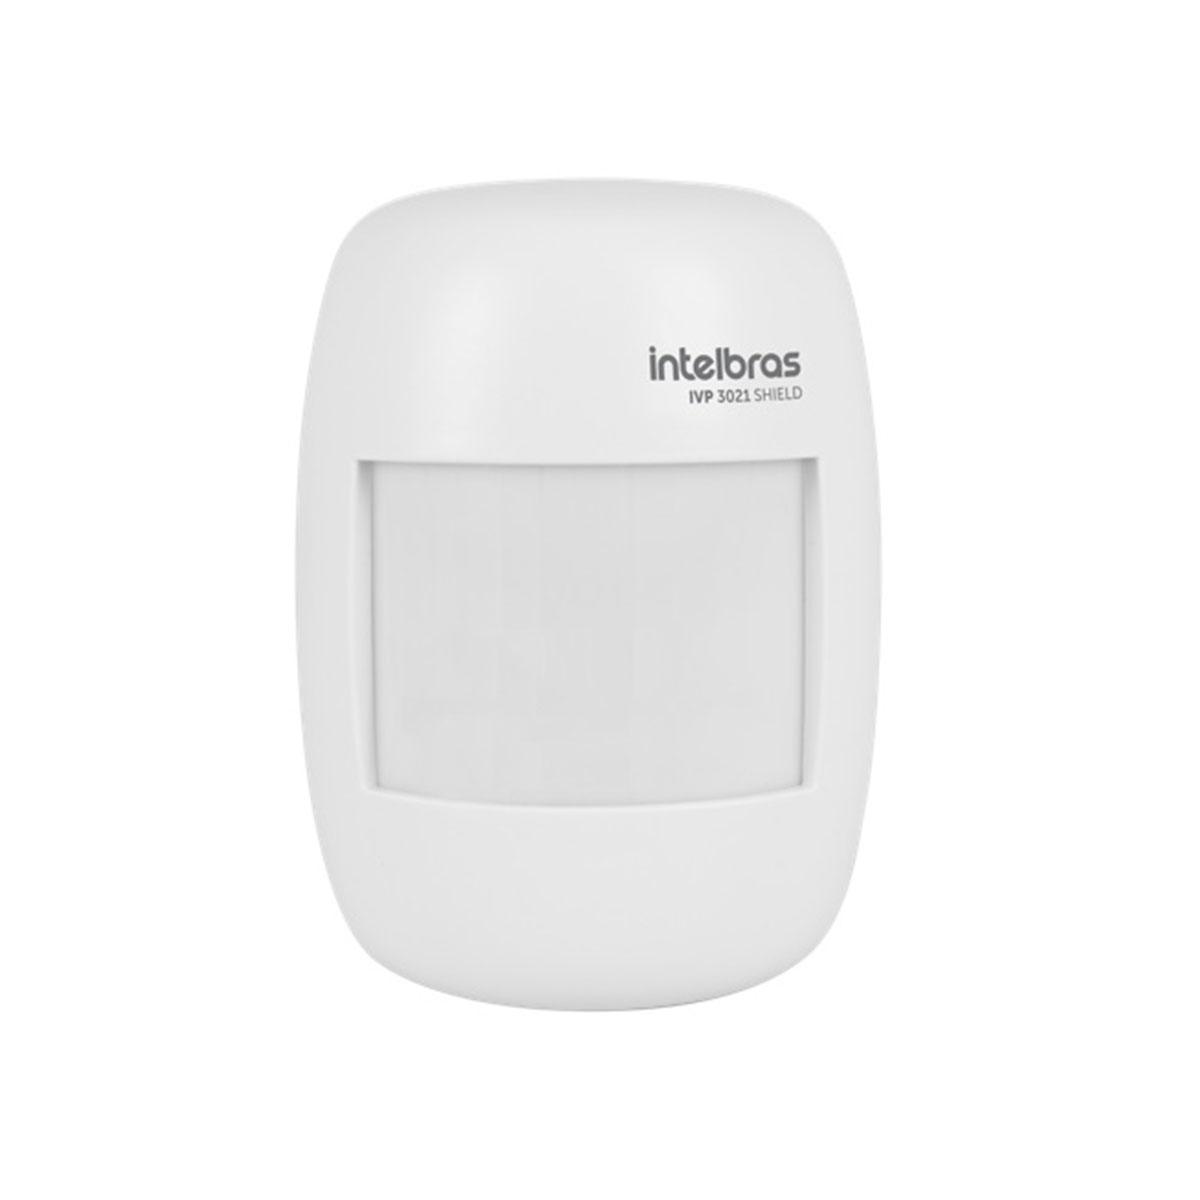 Kit 03 Sensor Interno Com Fio Intelbras Ivp 3021 Shield